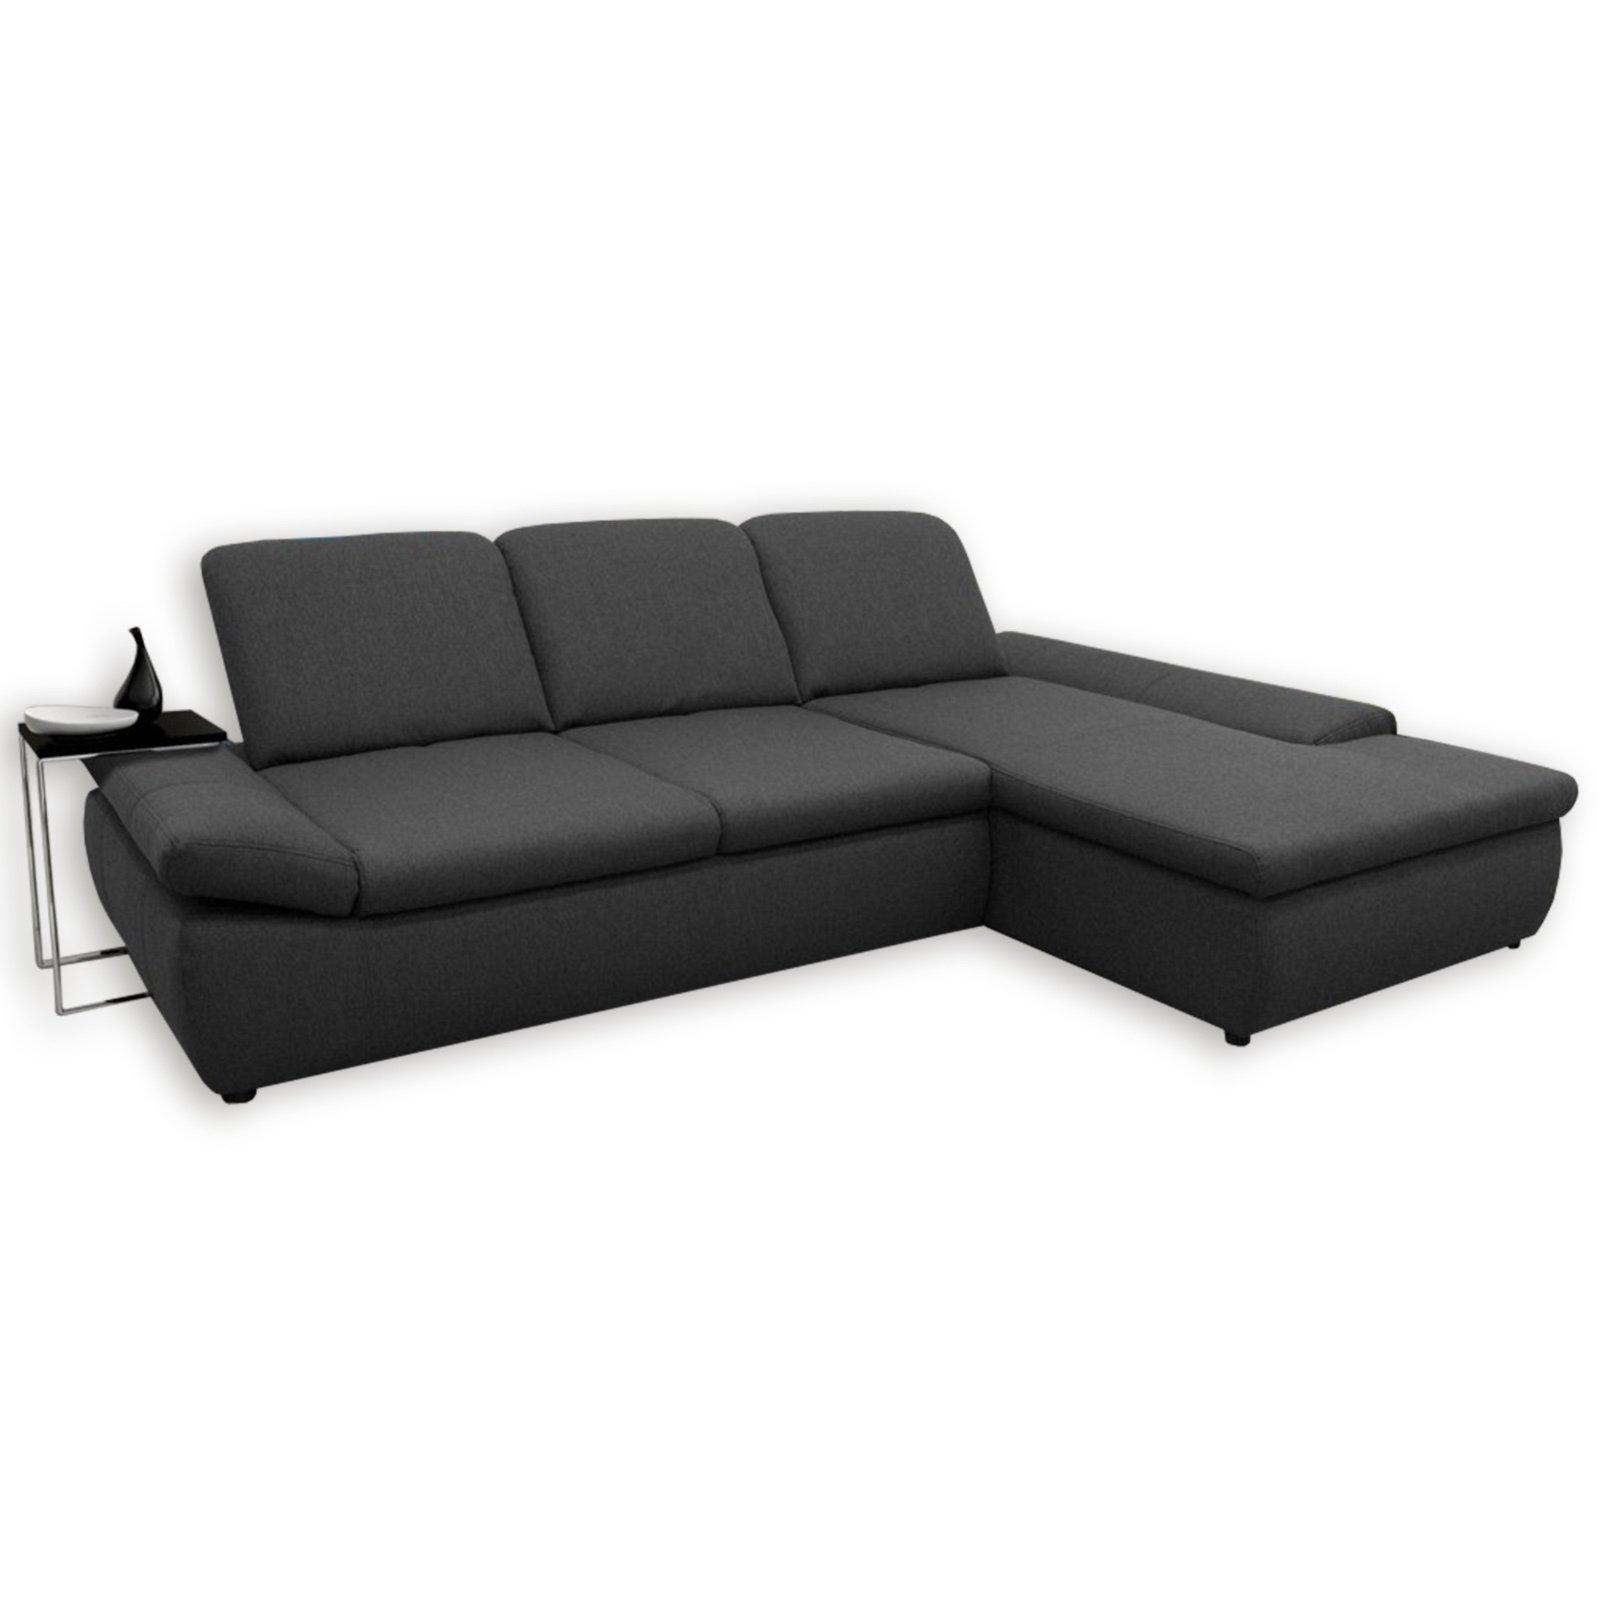 boxspringsofa anthrazit mit funktionen recamiere rechts ecksofas l form sofas. Black Bedroom Furniture Sets. Home Design Ideas